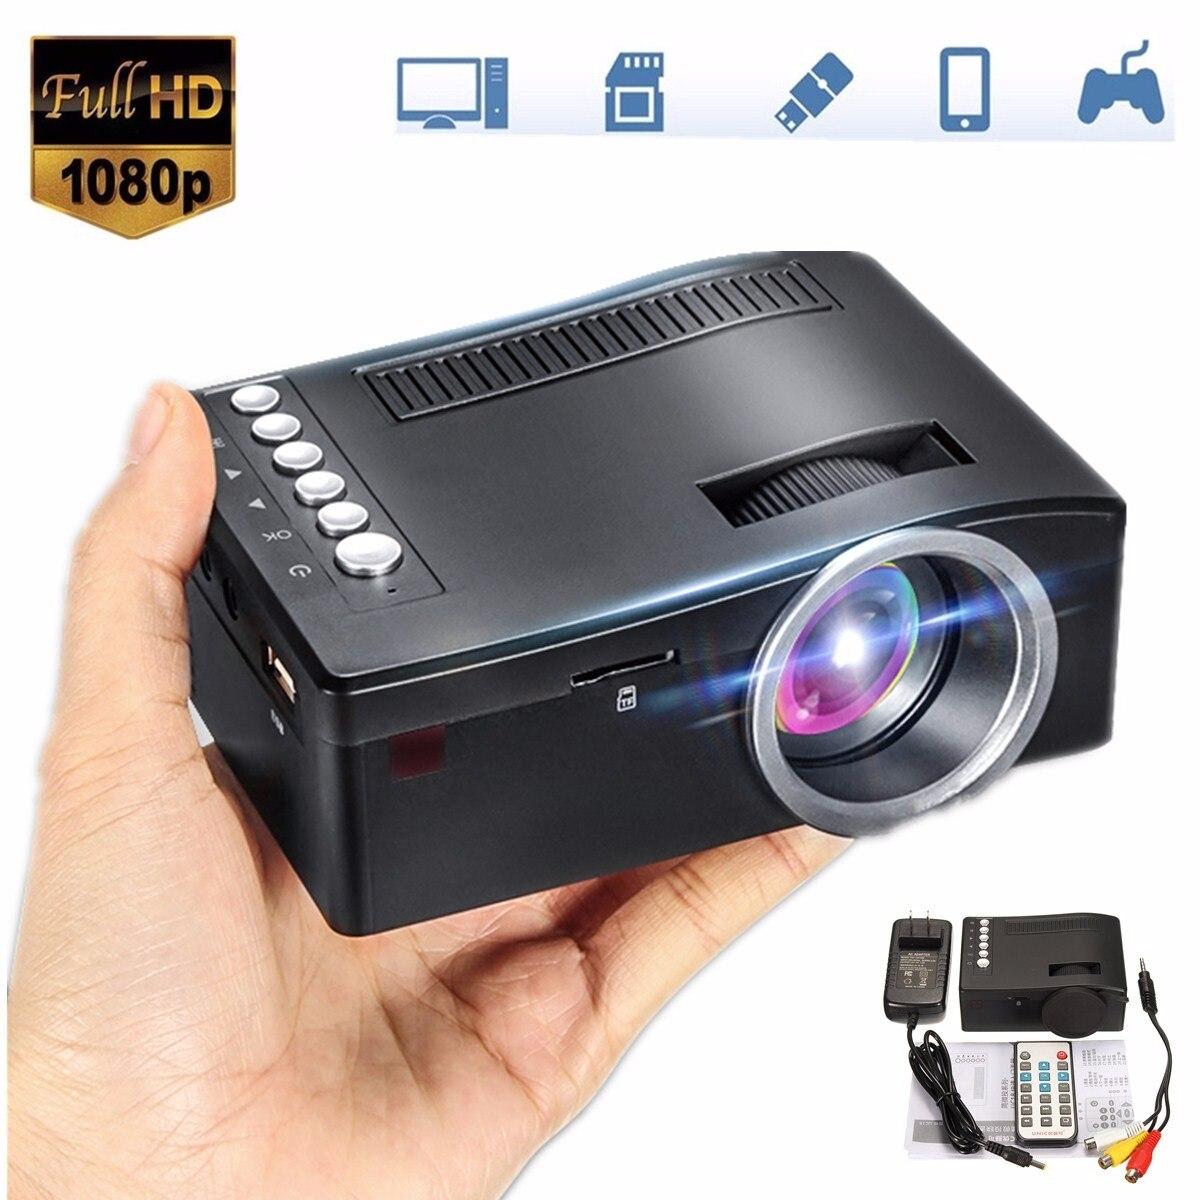 Mini cinéma Home cinéma système 1080 P HD multimédia projecteur TV AV USB TF HDMI PC LED numérique poche maison projecteur maison maison